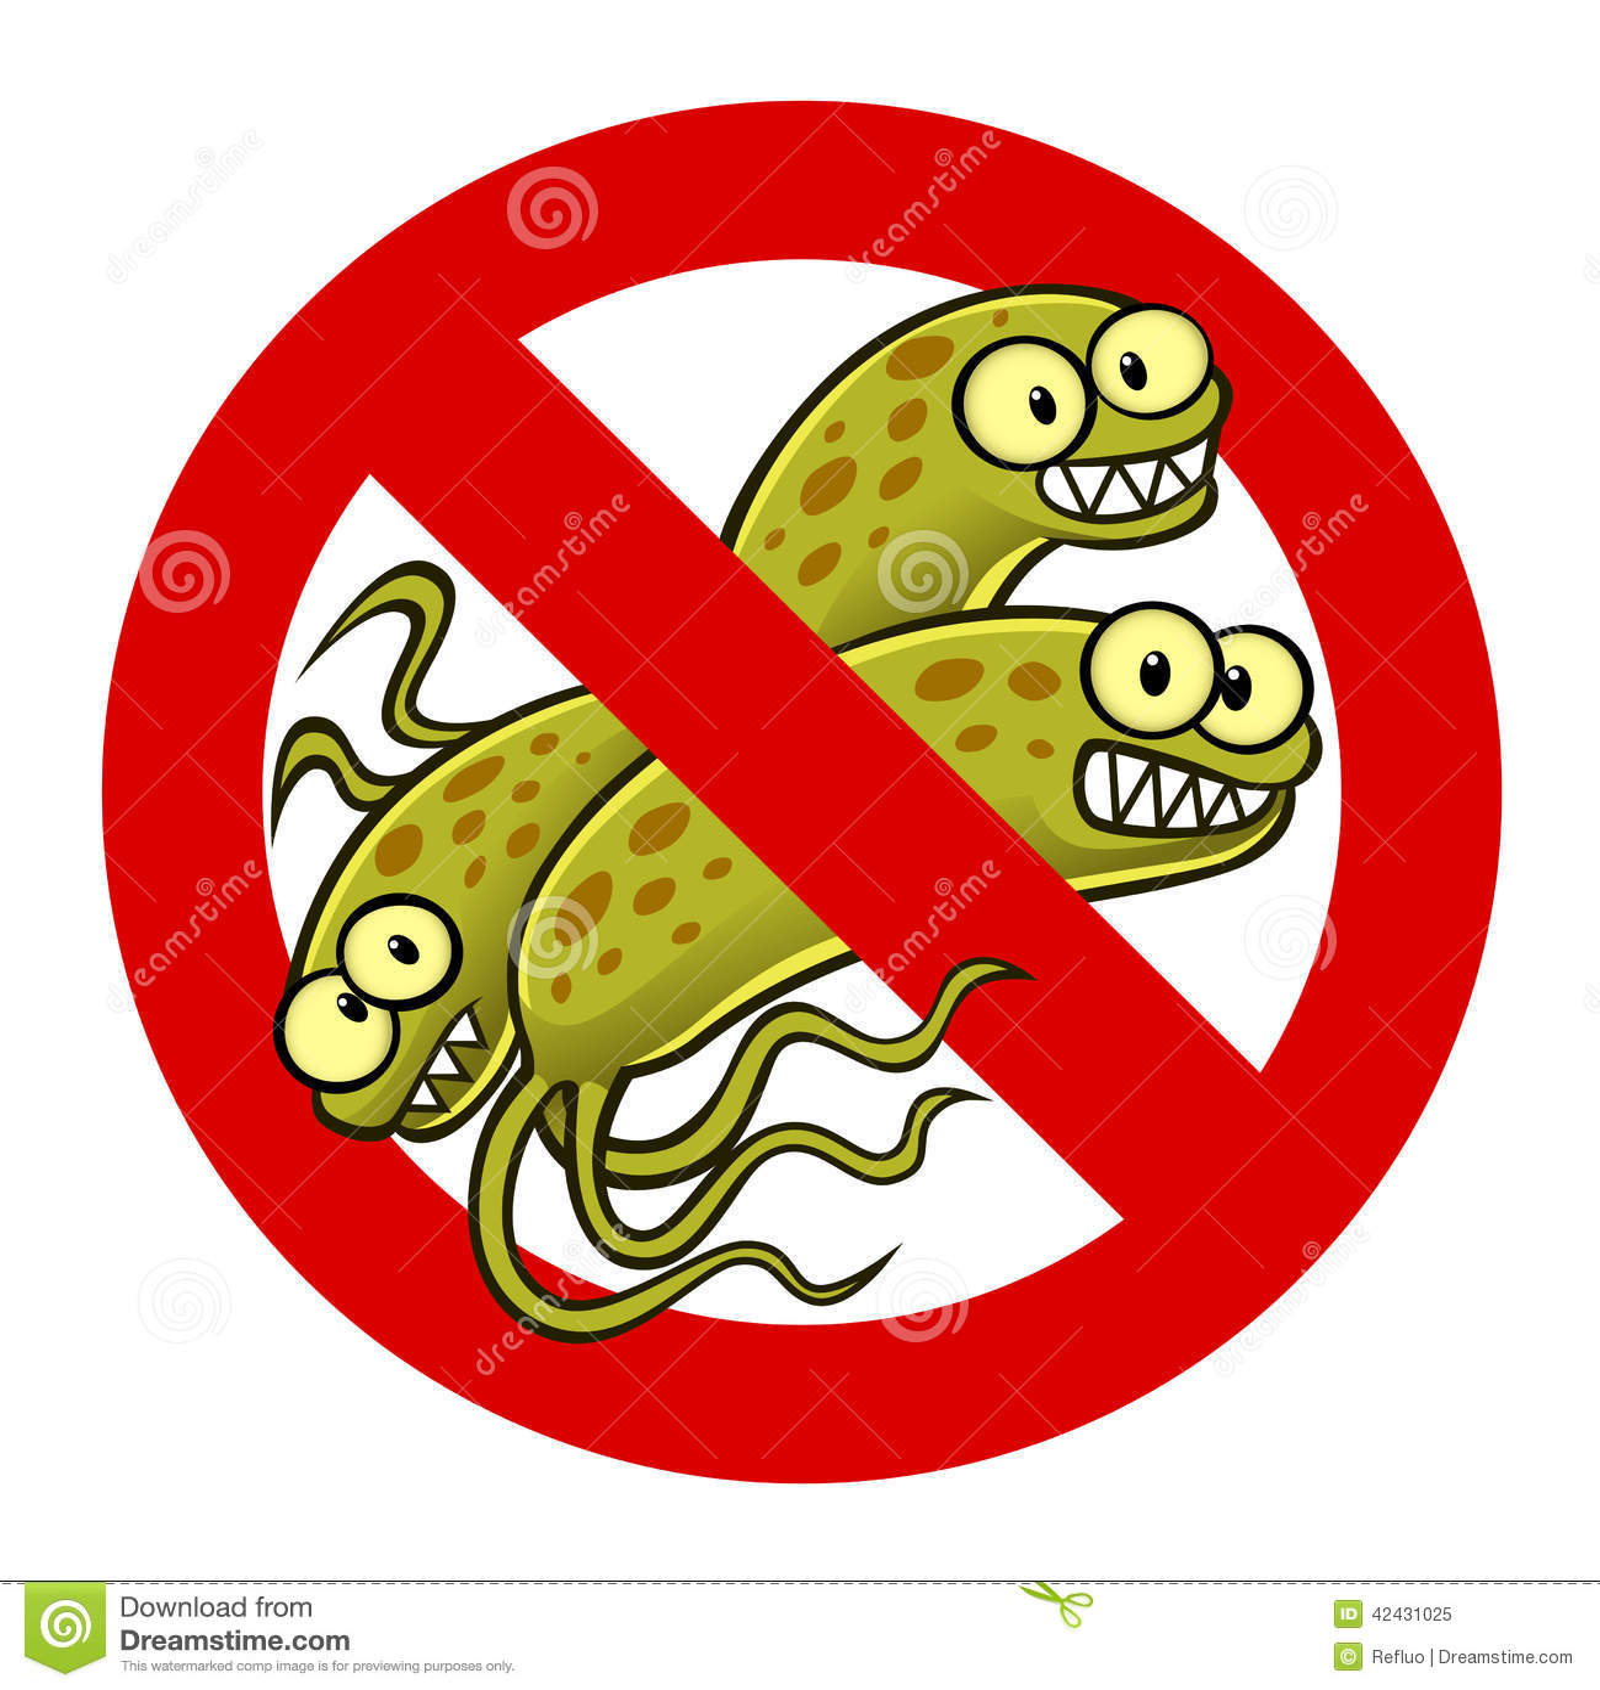 Anti Bacterium Sign Stock Vector Illustration Of Symbol